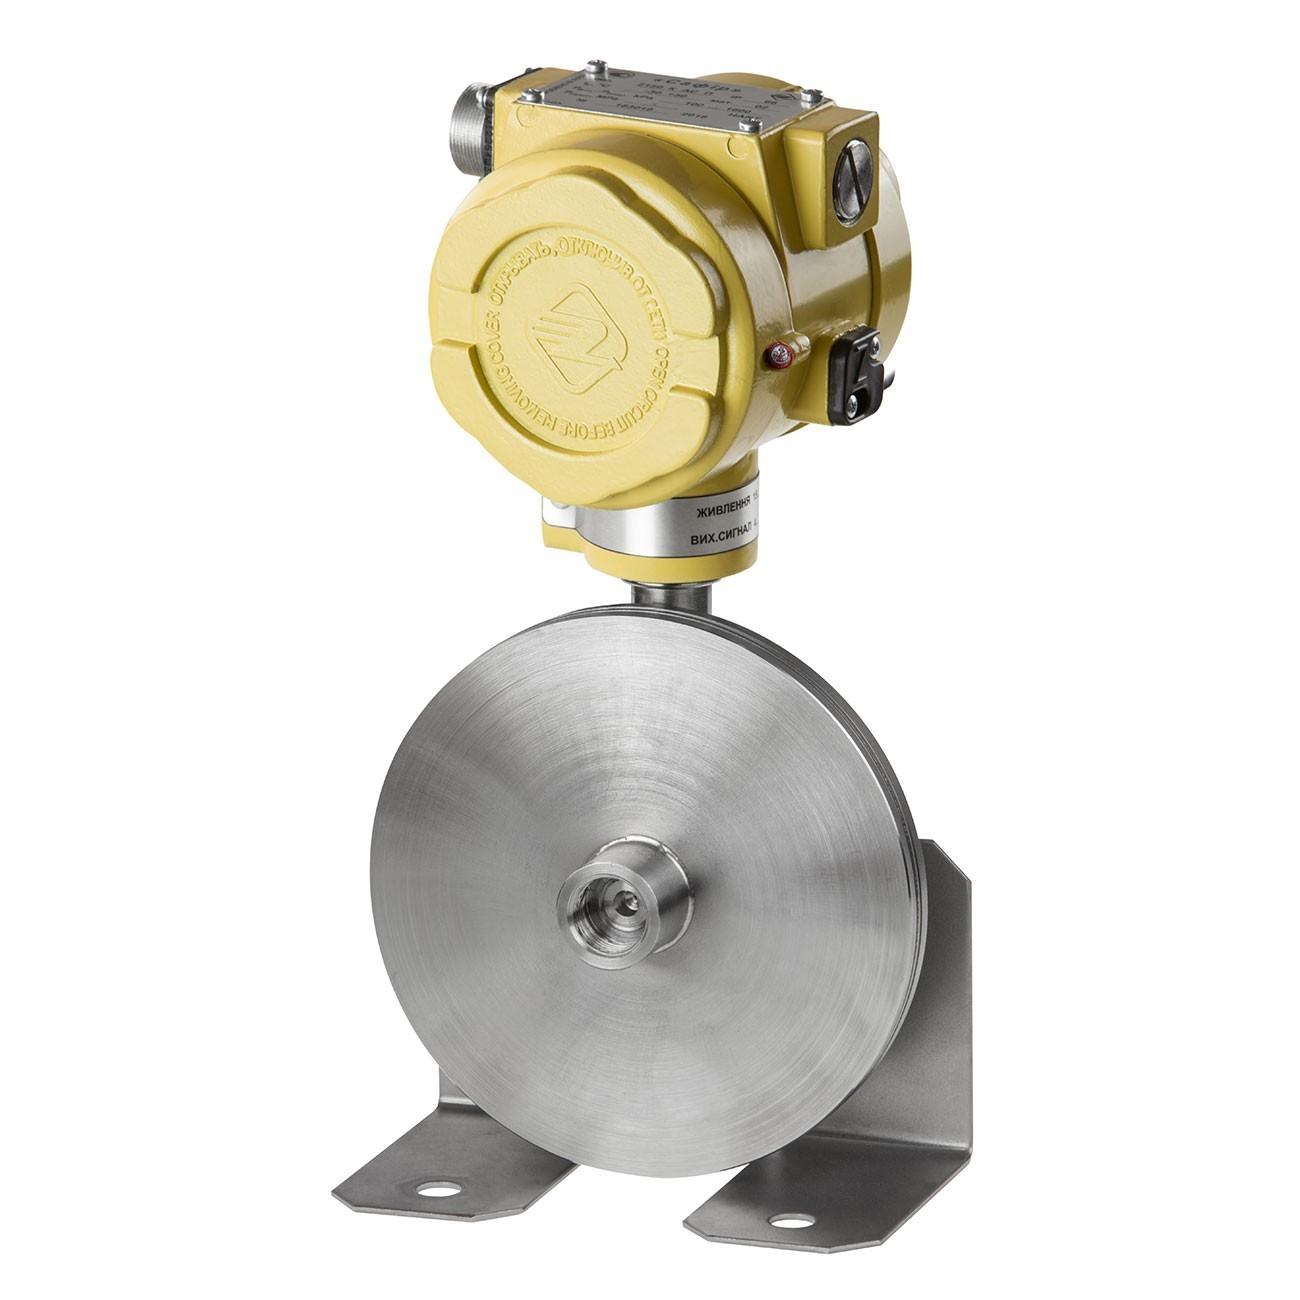 Analog Gauge Pressure Transmitters Safir 2101, 2201, 2301